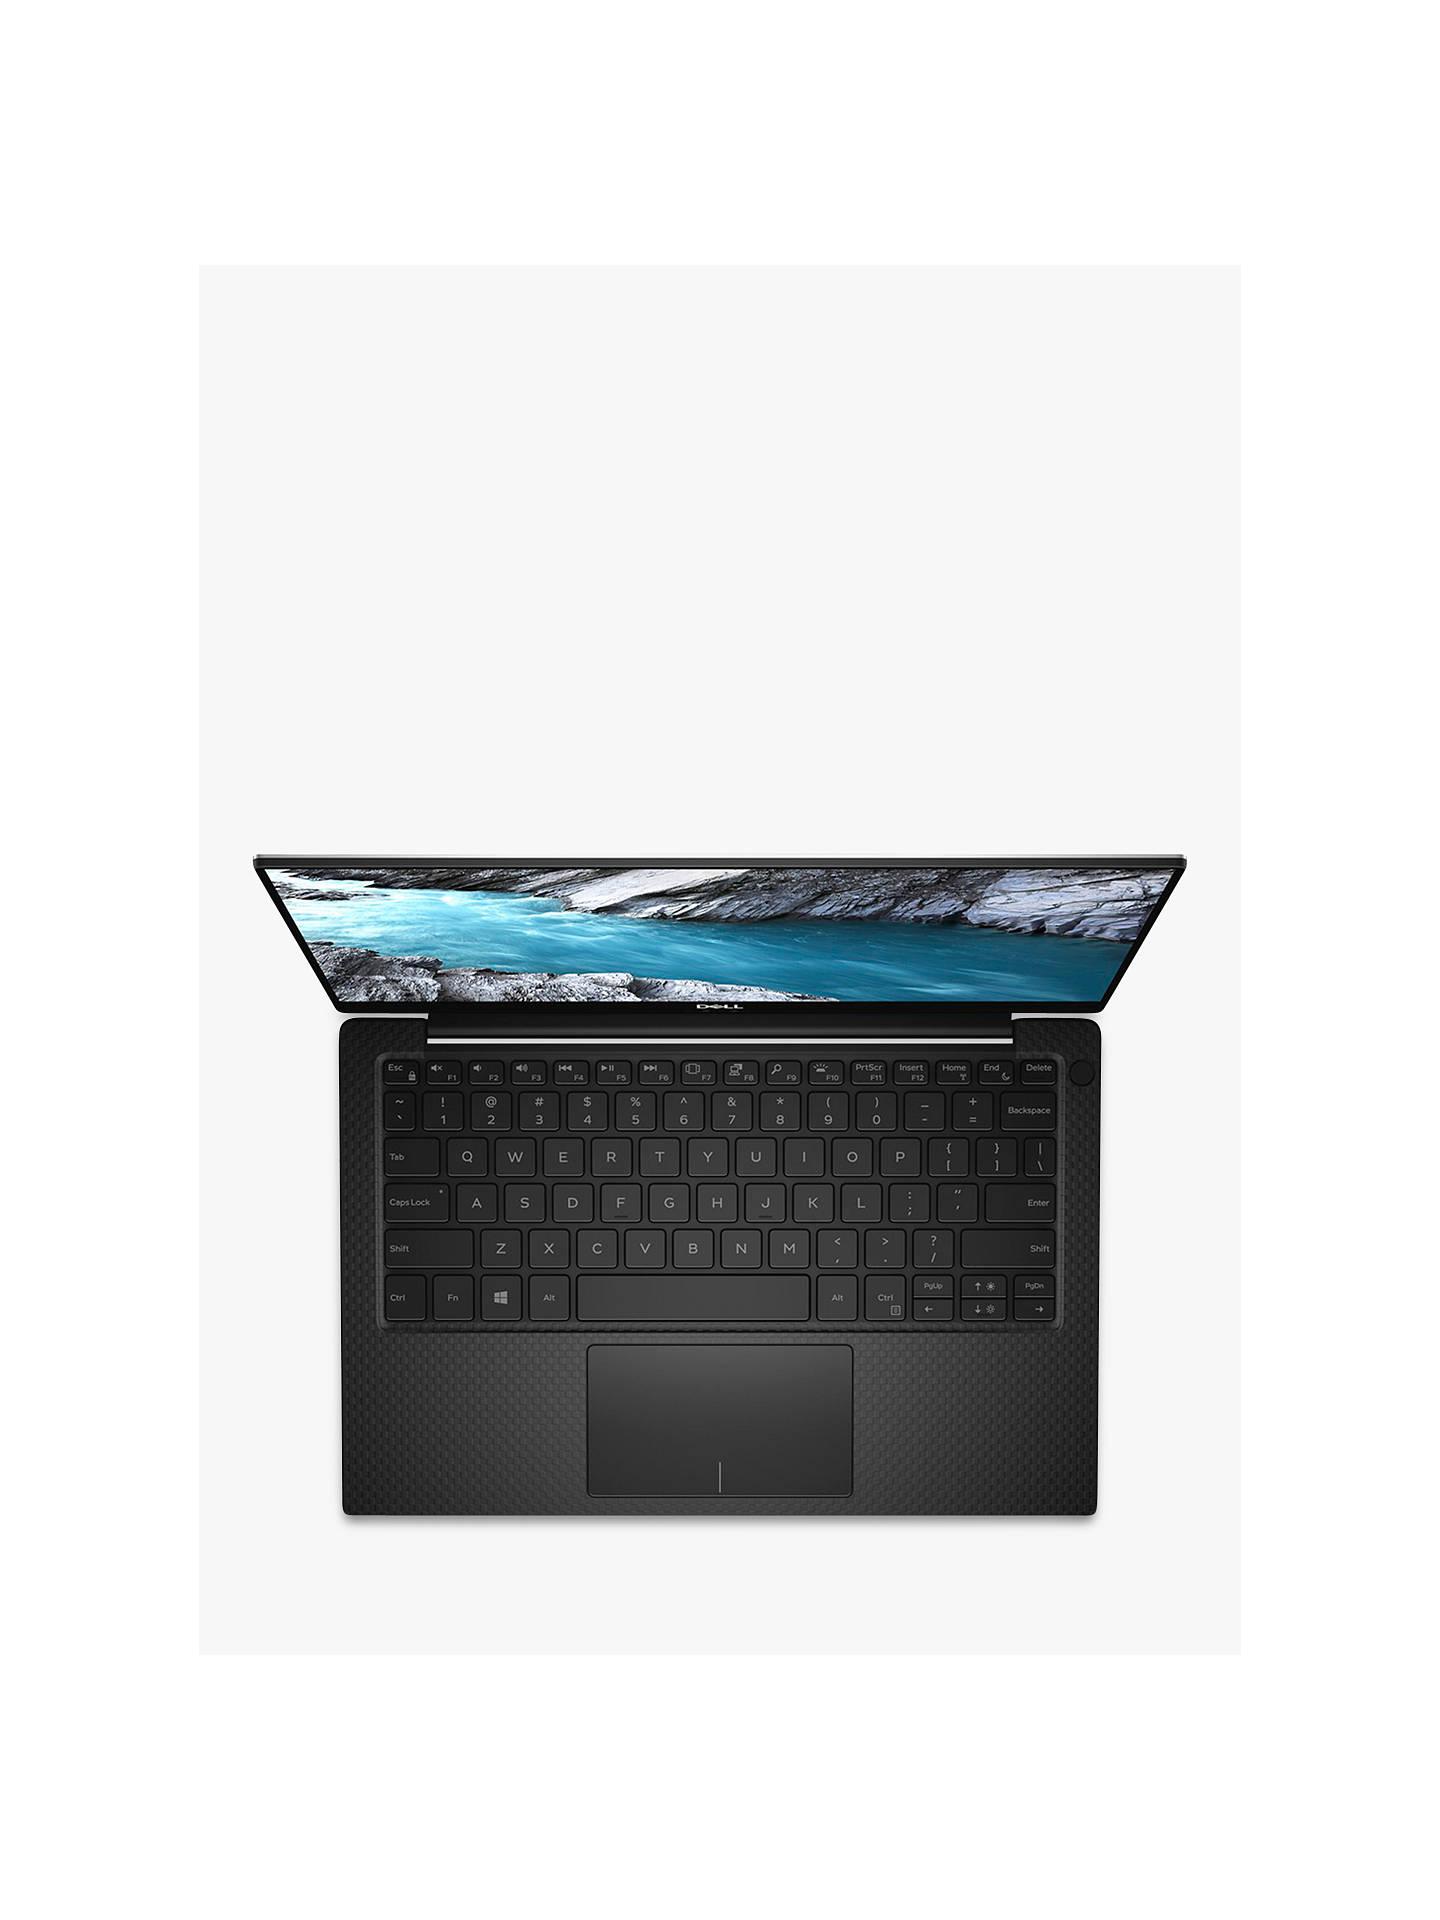 "Dell XPS 13 9370 Laptop, Intel Core i7, 8GB RAM, 256GB SSD, 13 3"", Full HD,  Silver"